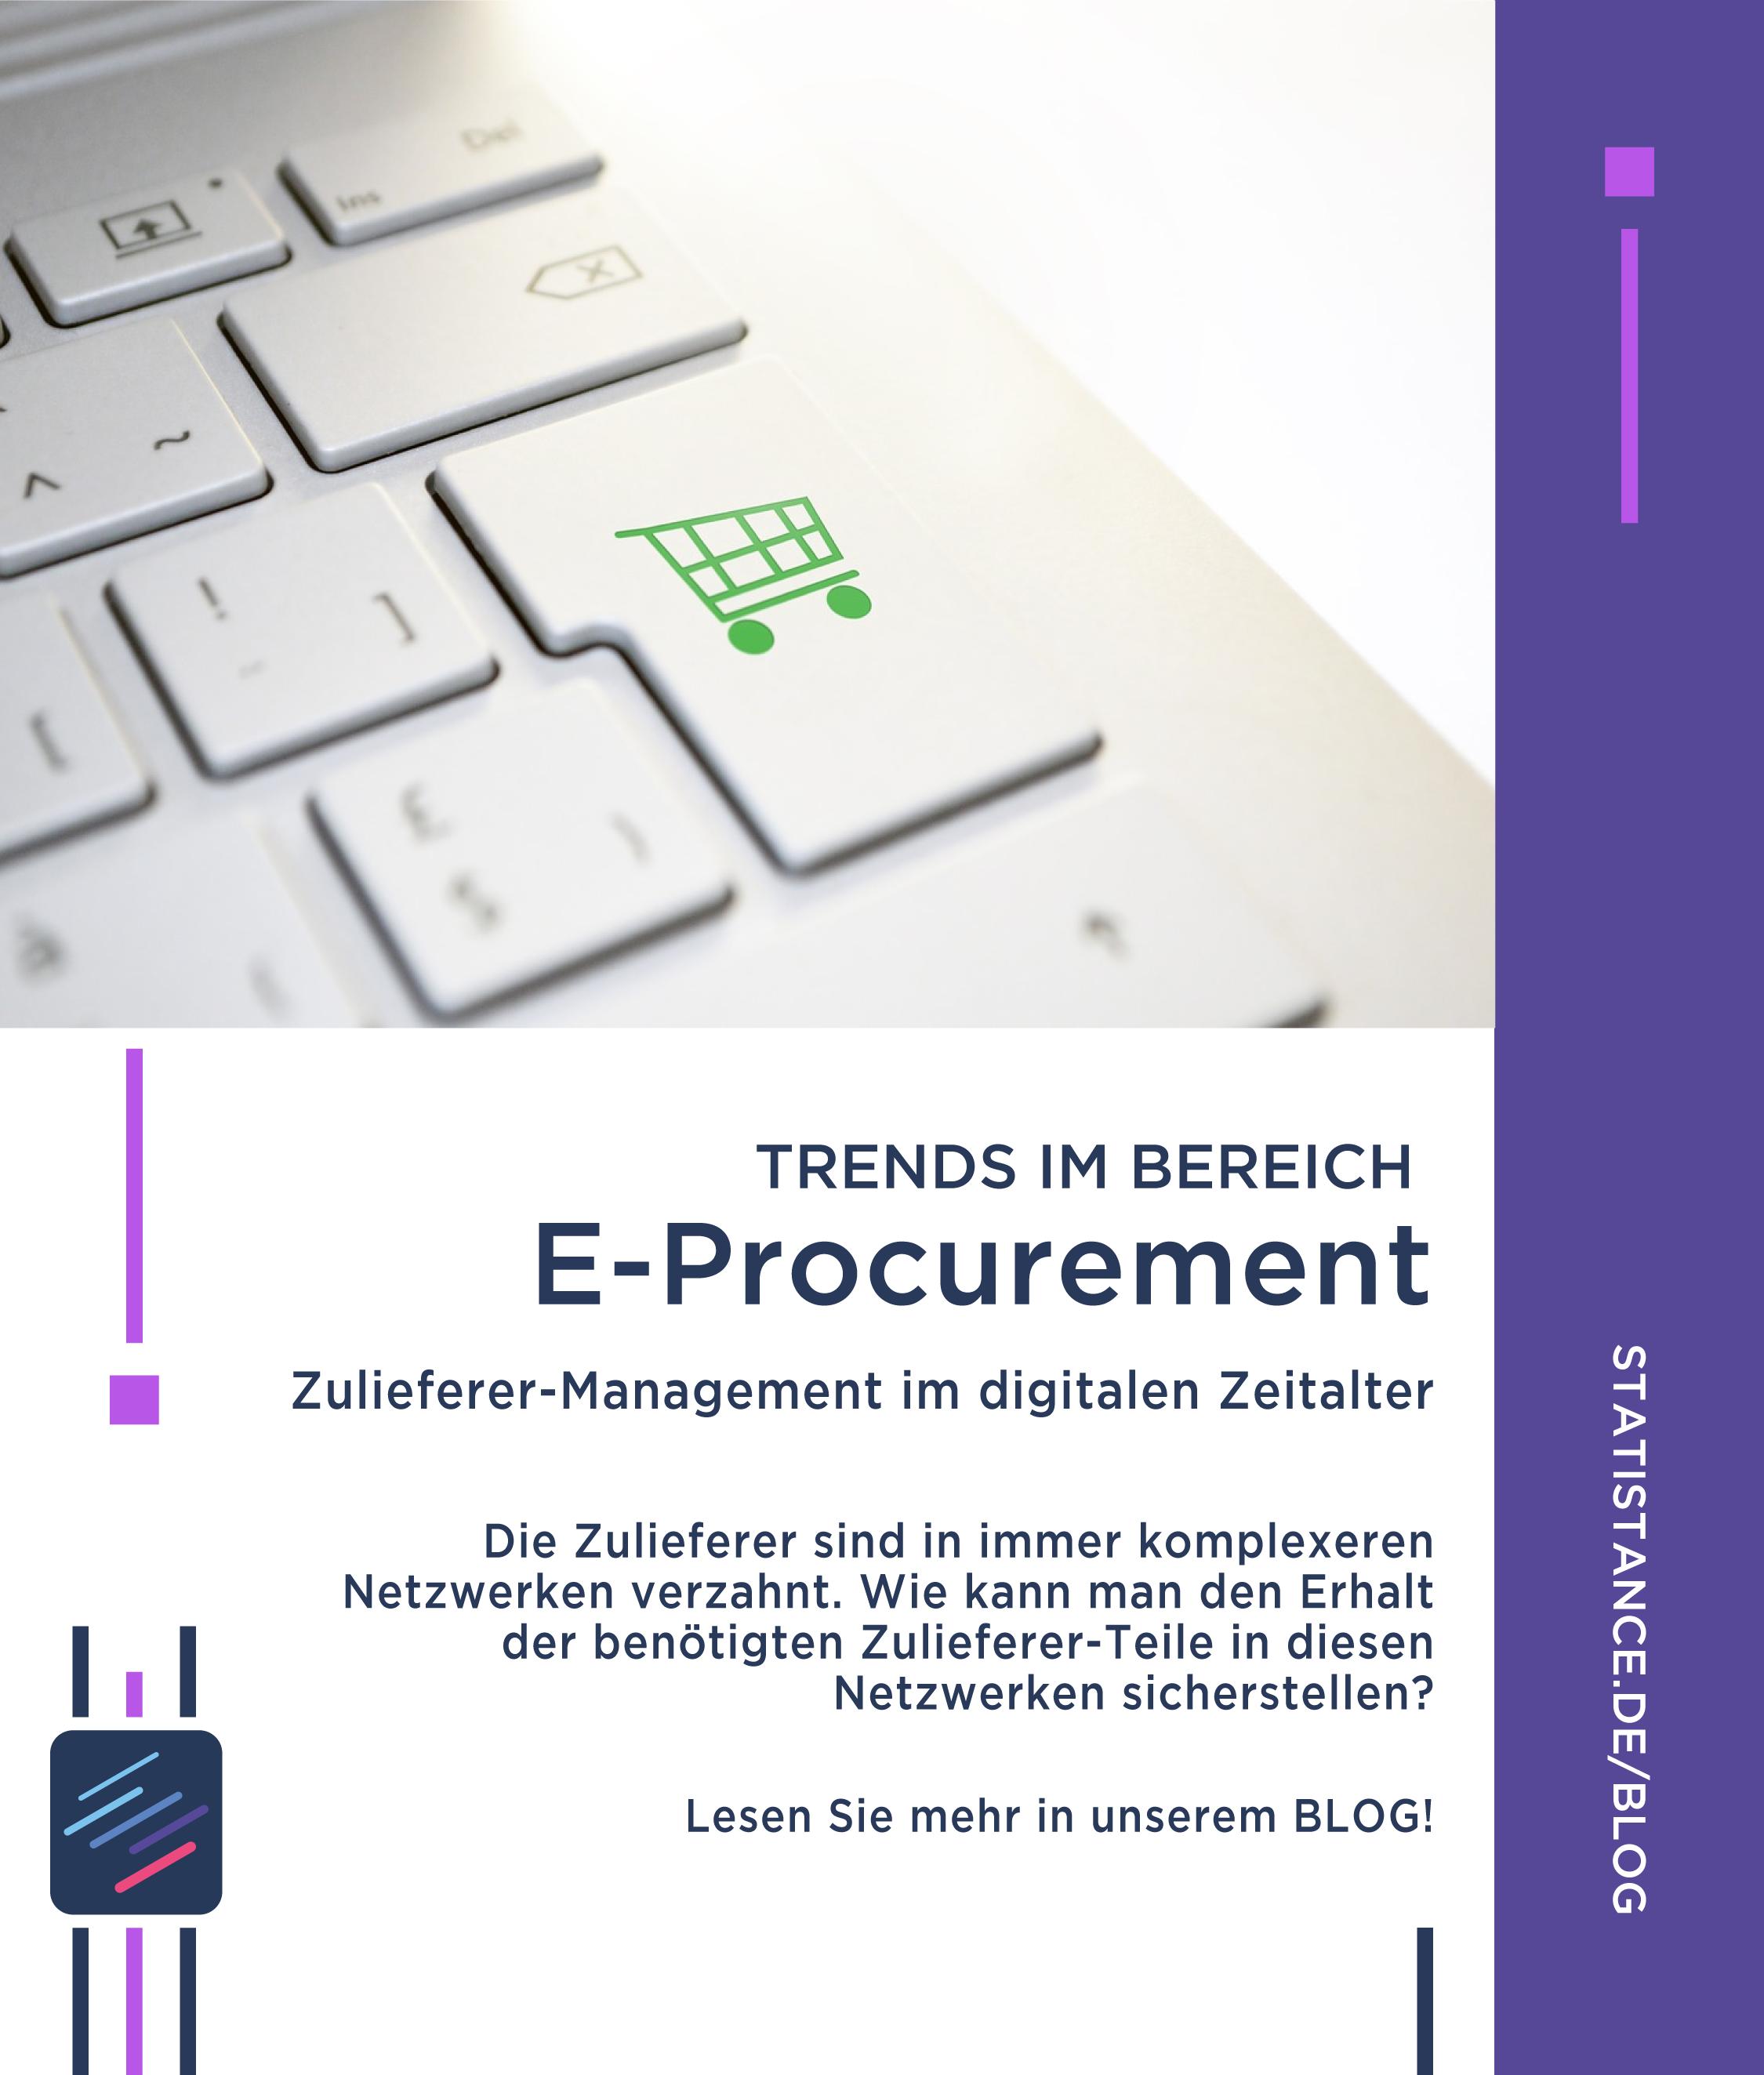 Trends im Bereich E-Procurements